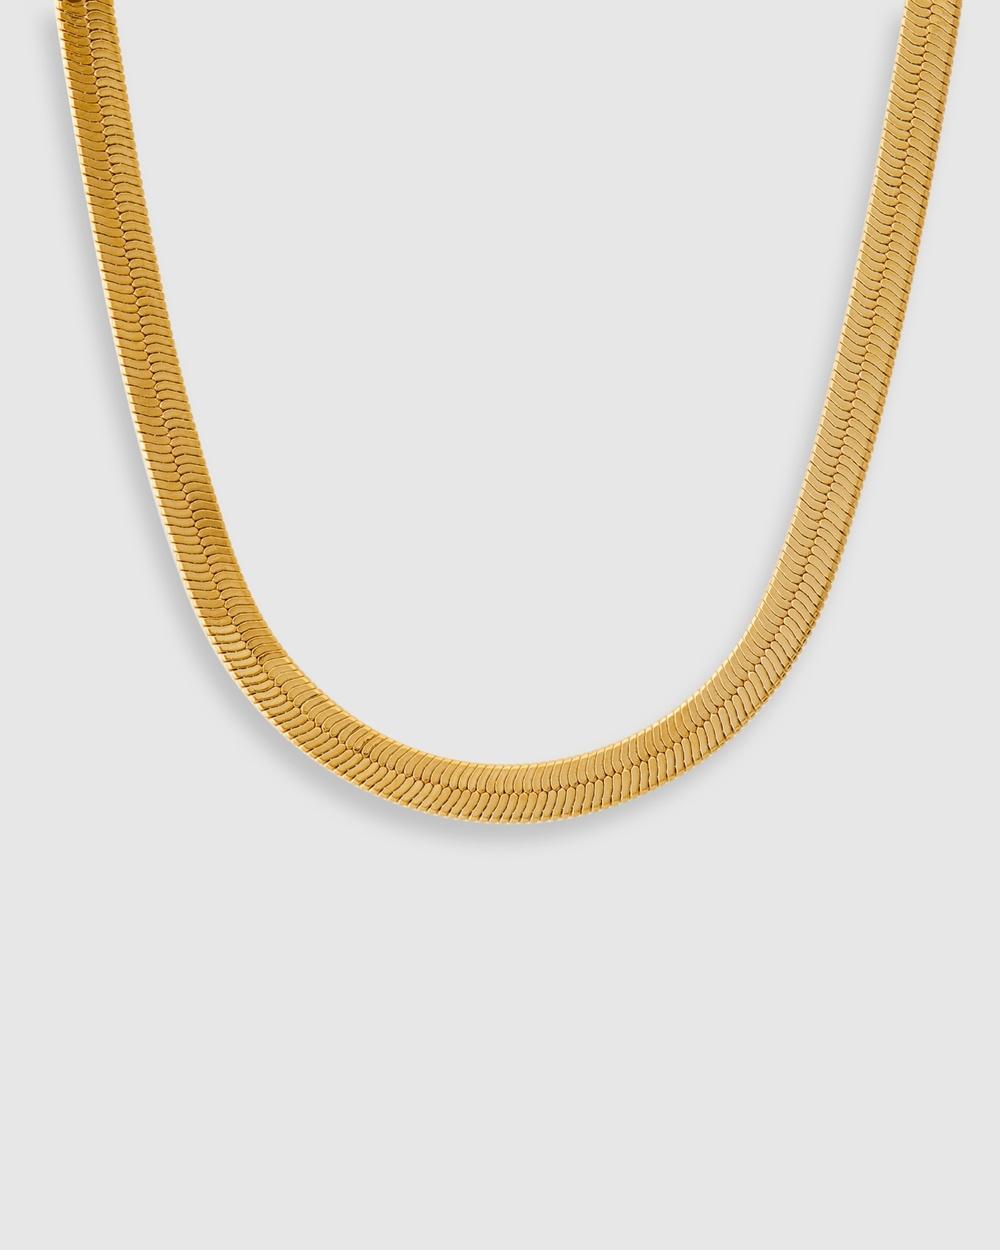 ALIX YANG Sienna Chain Jewellery Gold